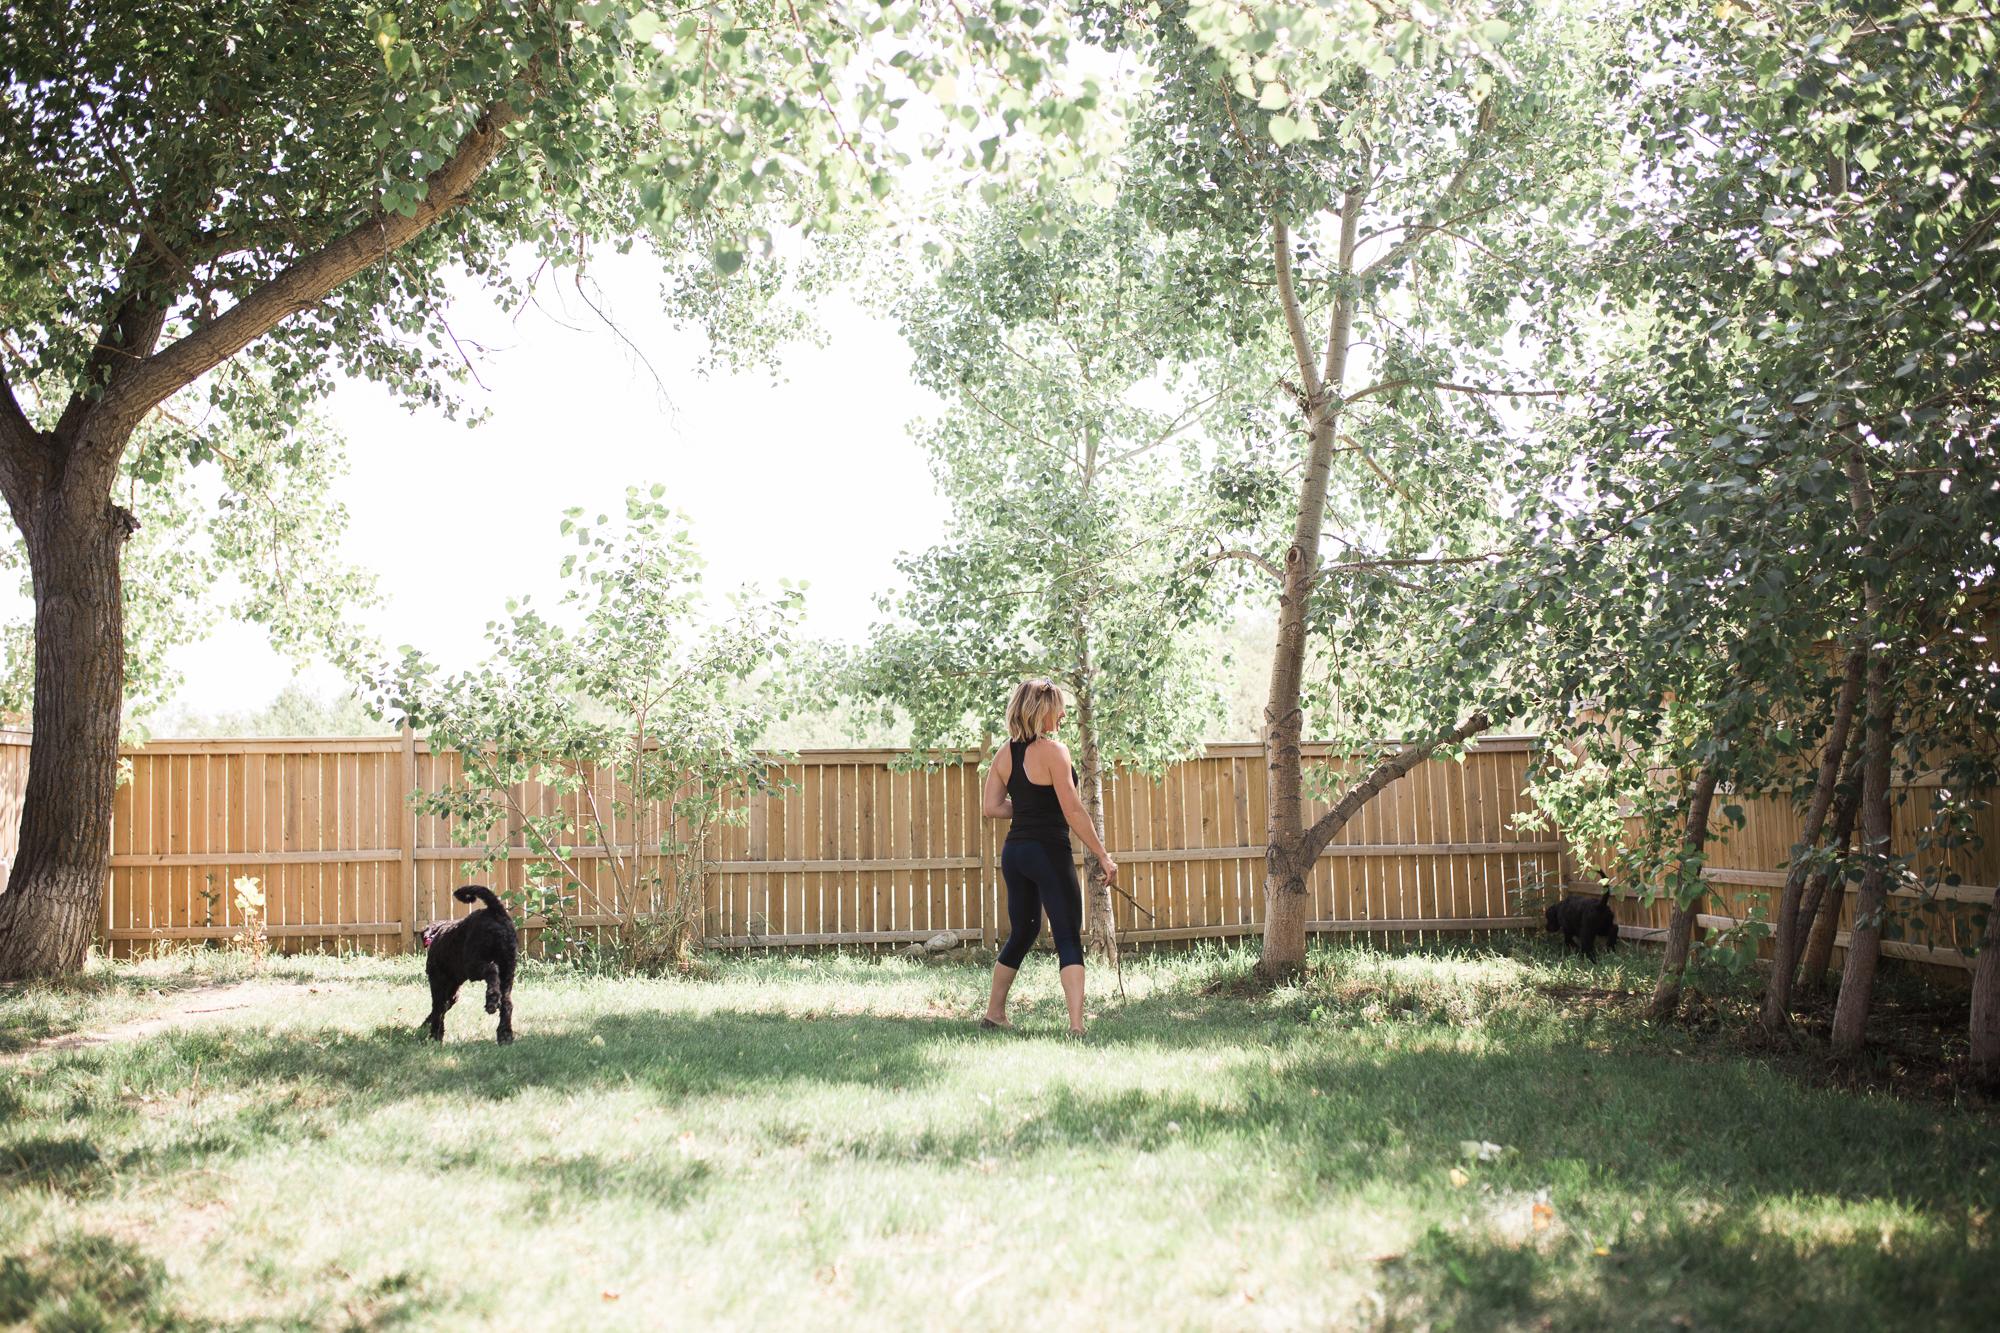 Barking-Good-Facility-14.jpg